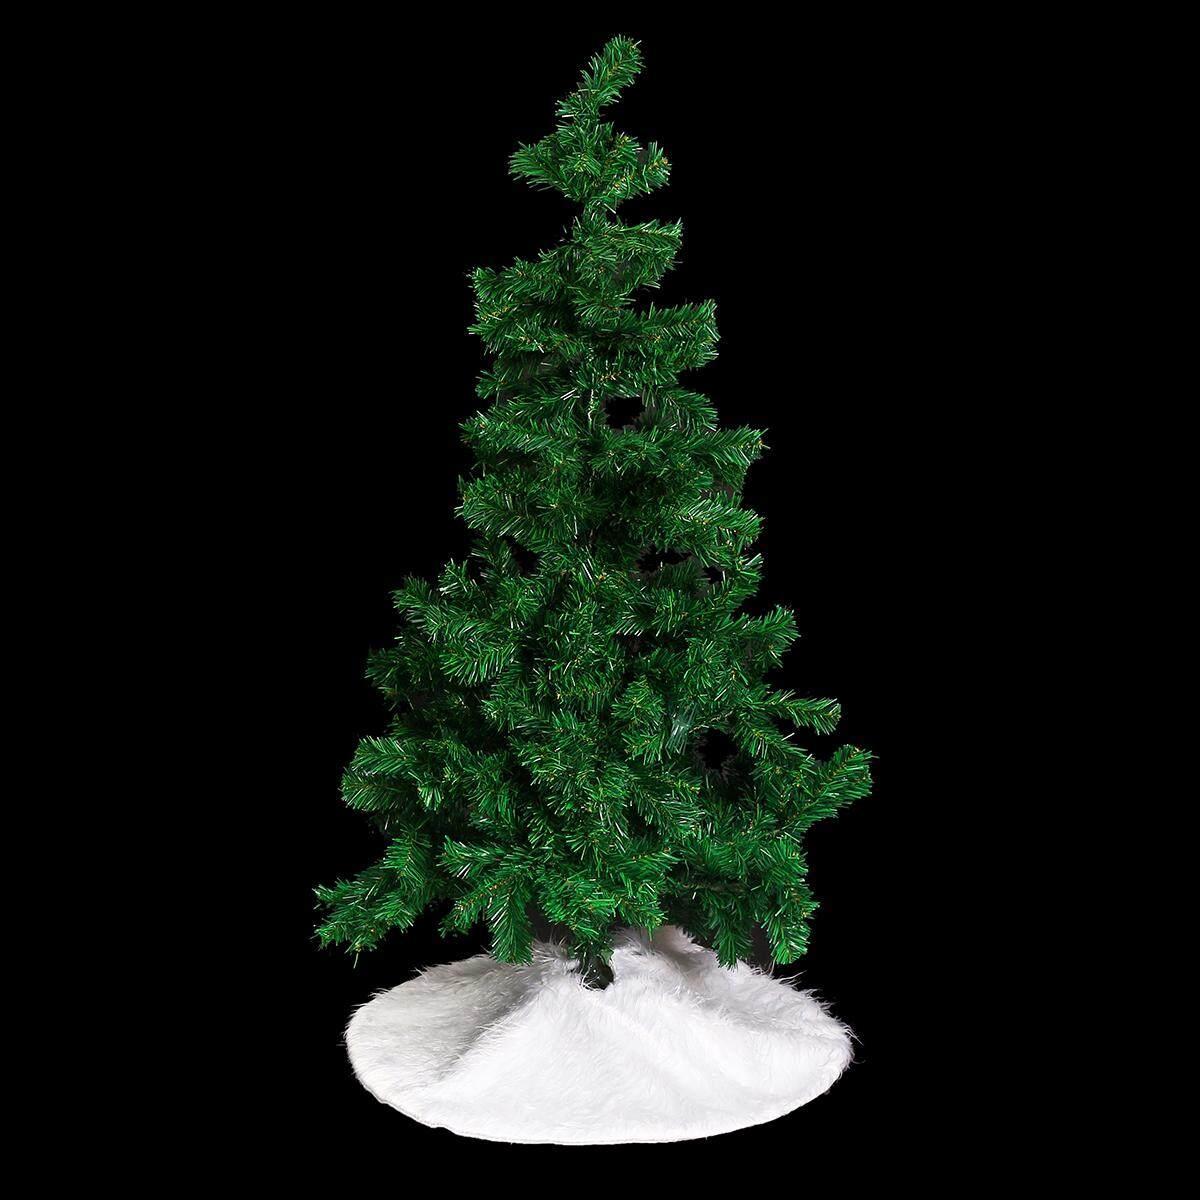 70cm Christmas Tree Soft Skirt Floor Mat Cover Plush Rug XMAS Party Home Decor7